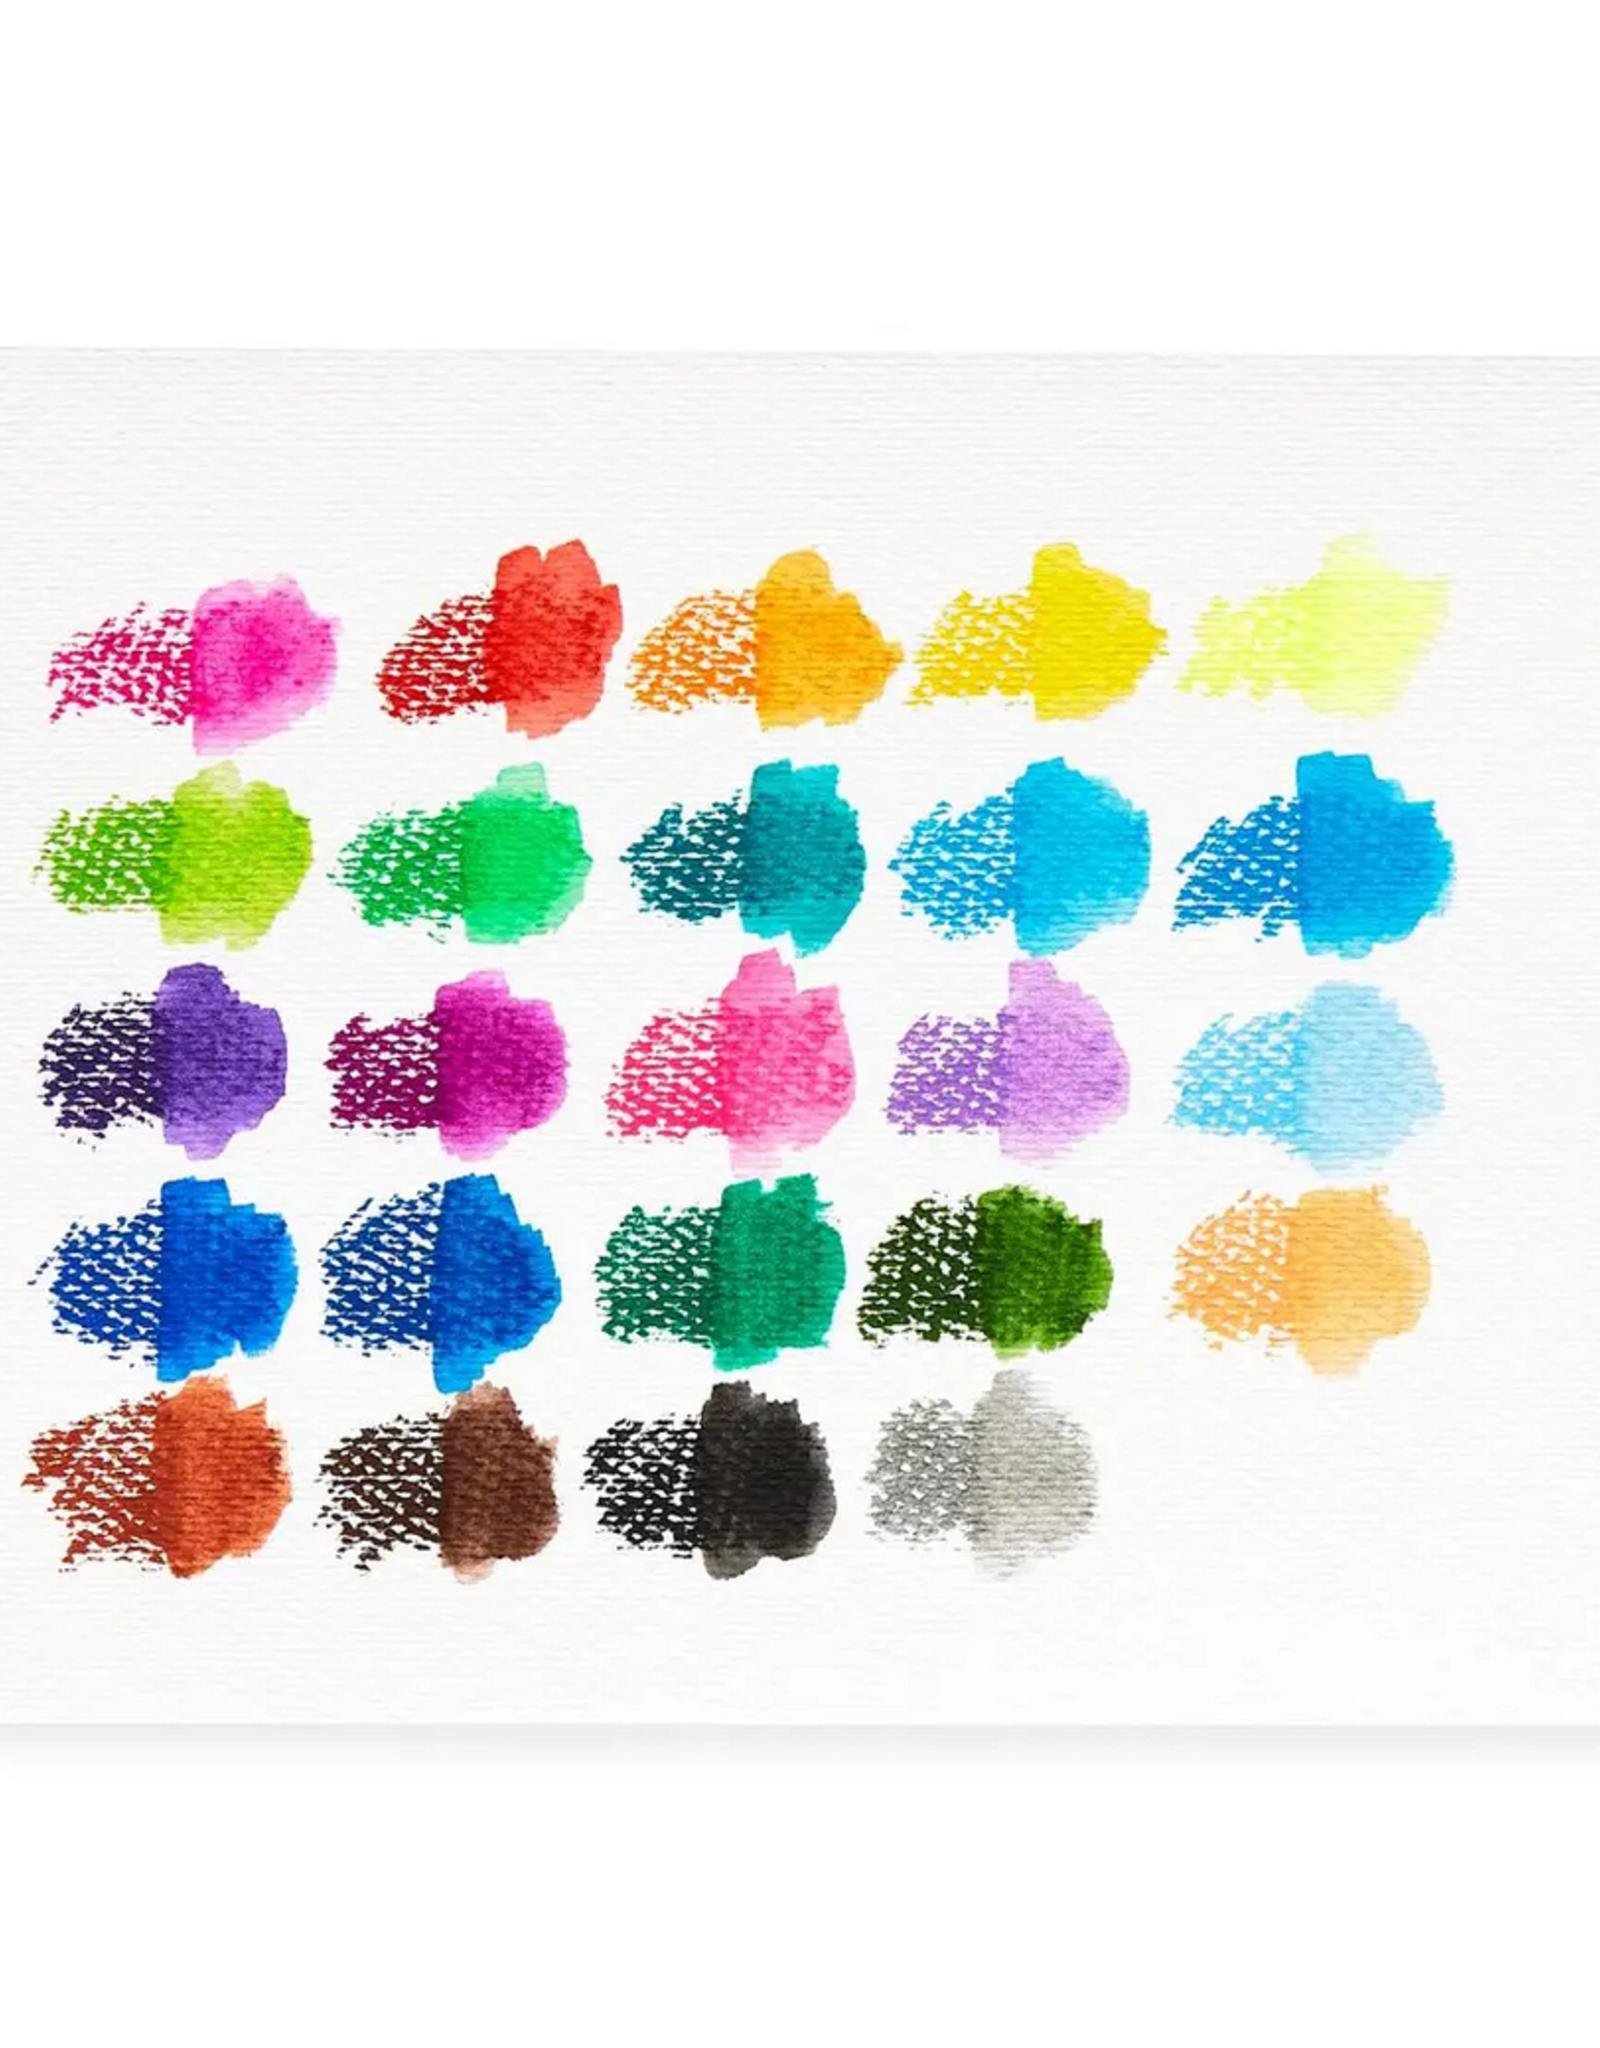 Ooly Ooly | Smooth Stix Watercolor Gel Crayons (Set of 24)